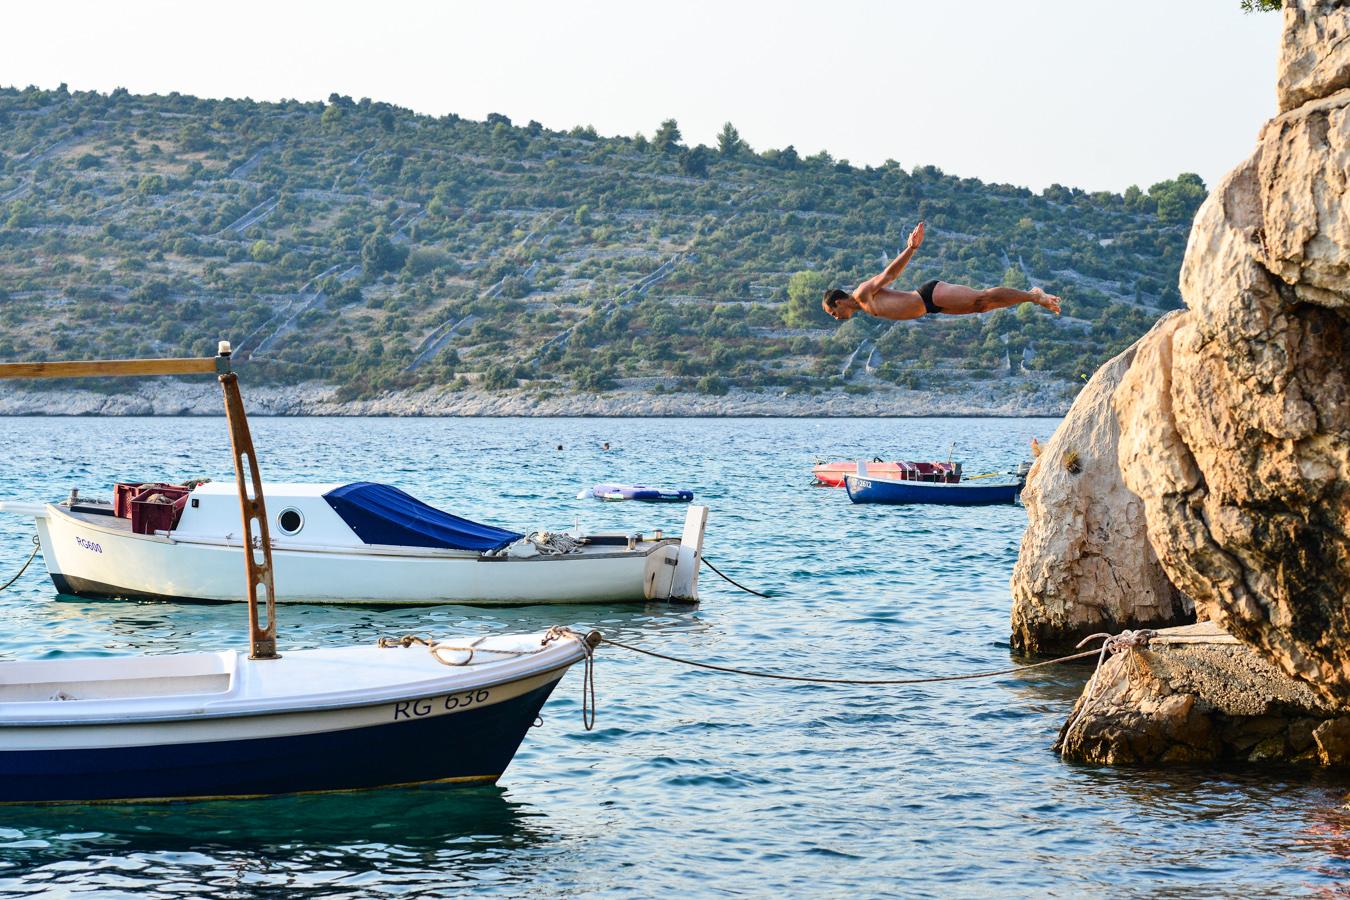 Crotia (3) - Diving into Adriatic Sea